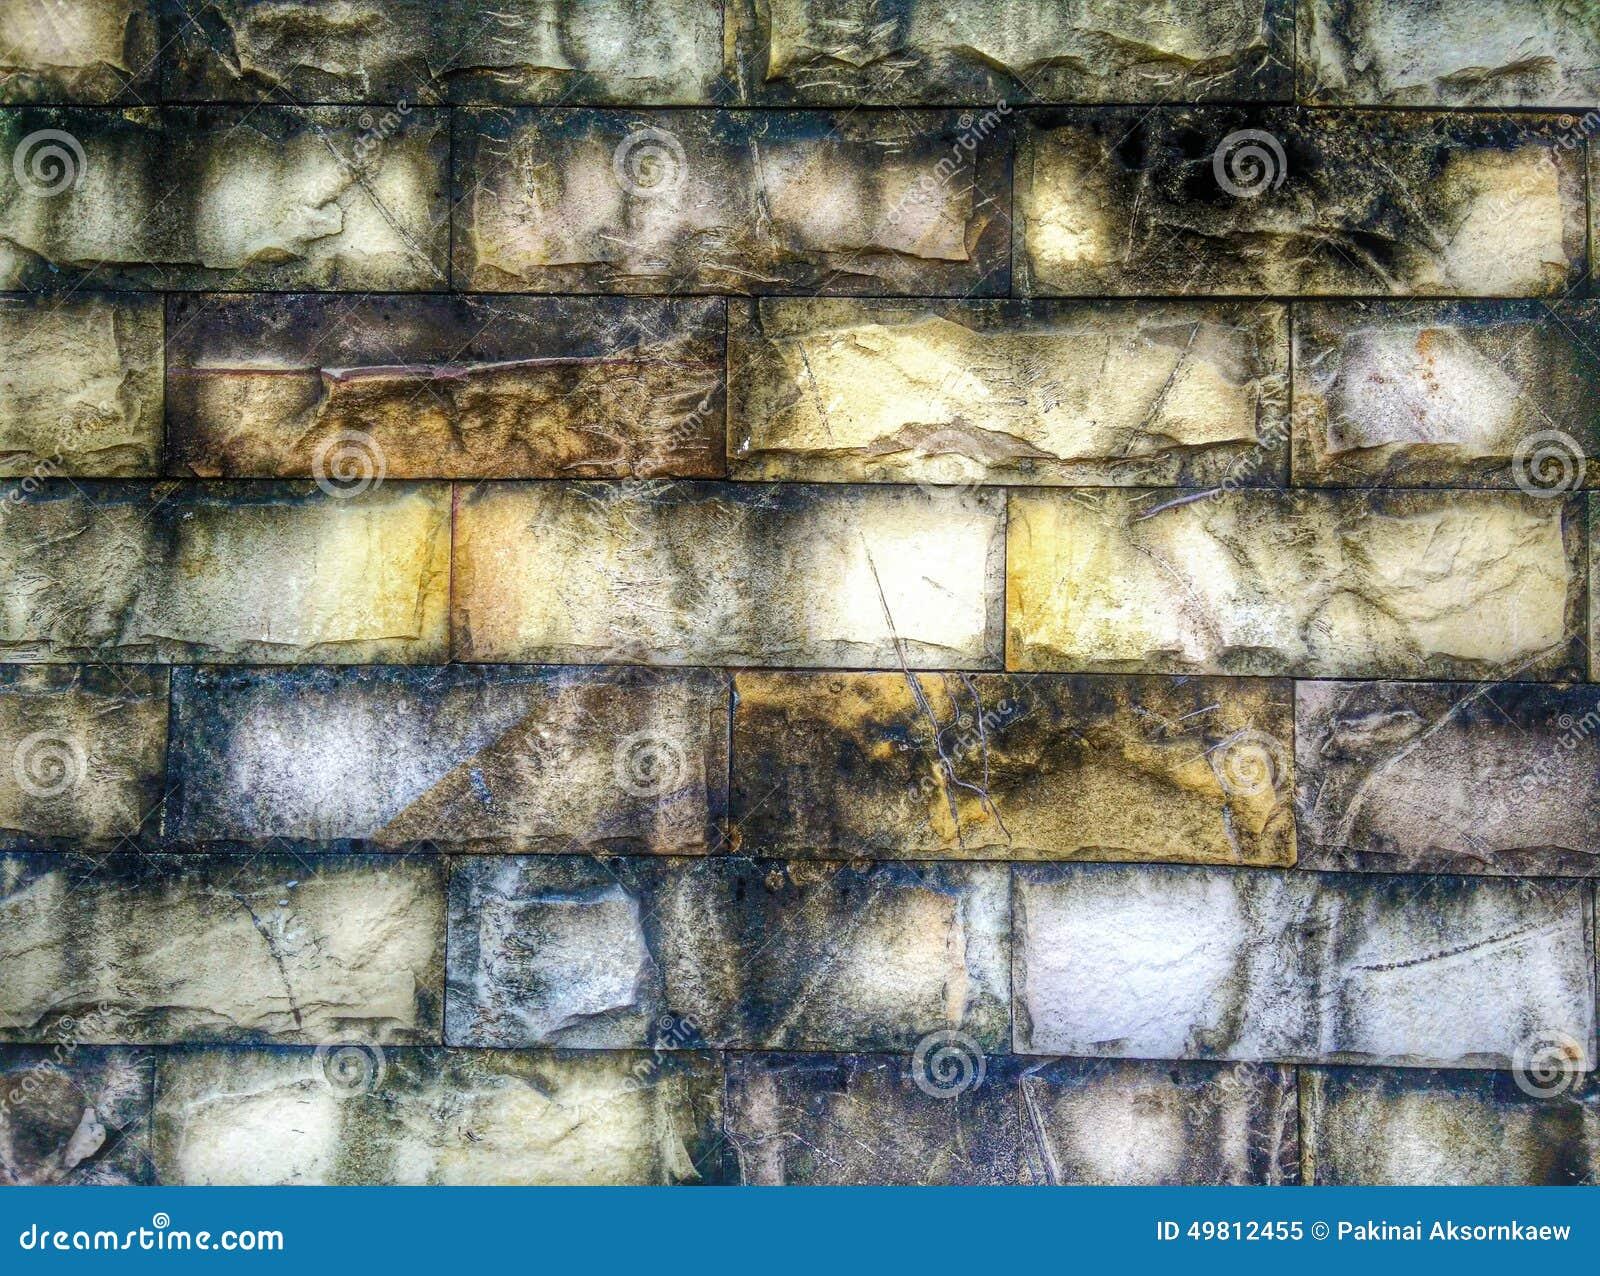 Abstract grunge brick pattern